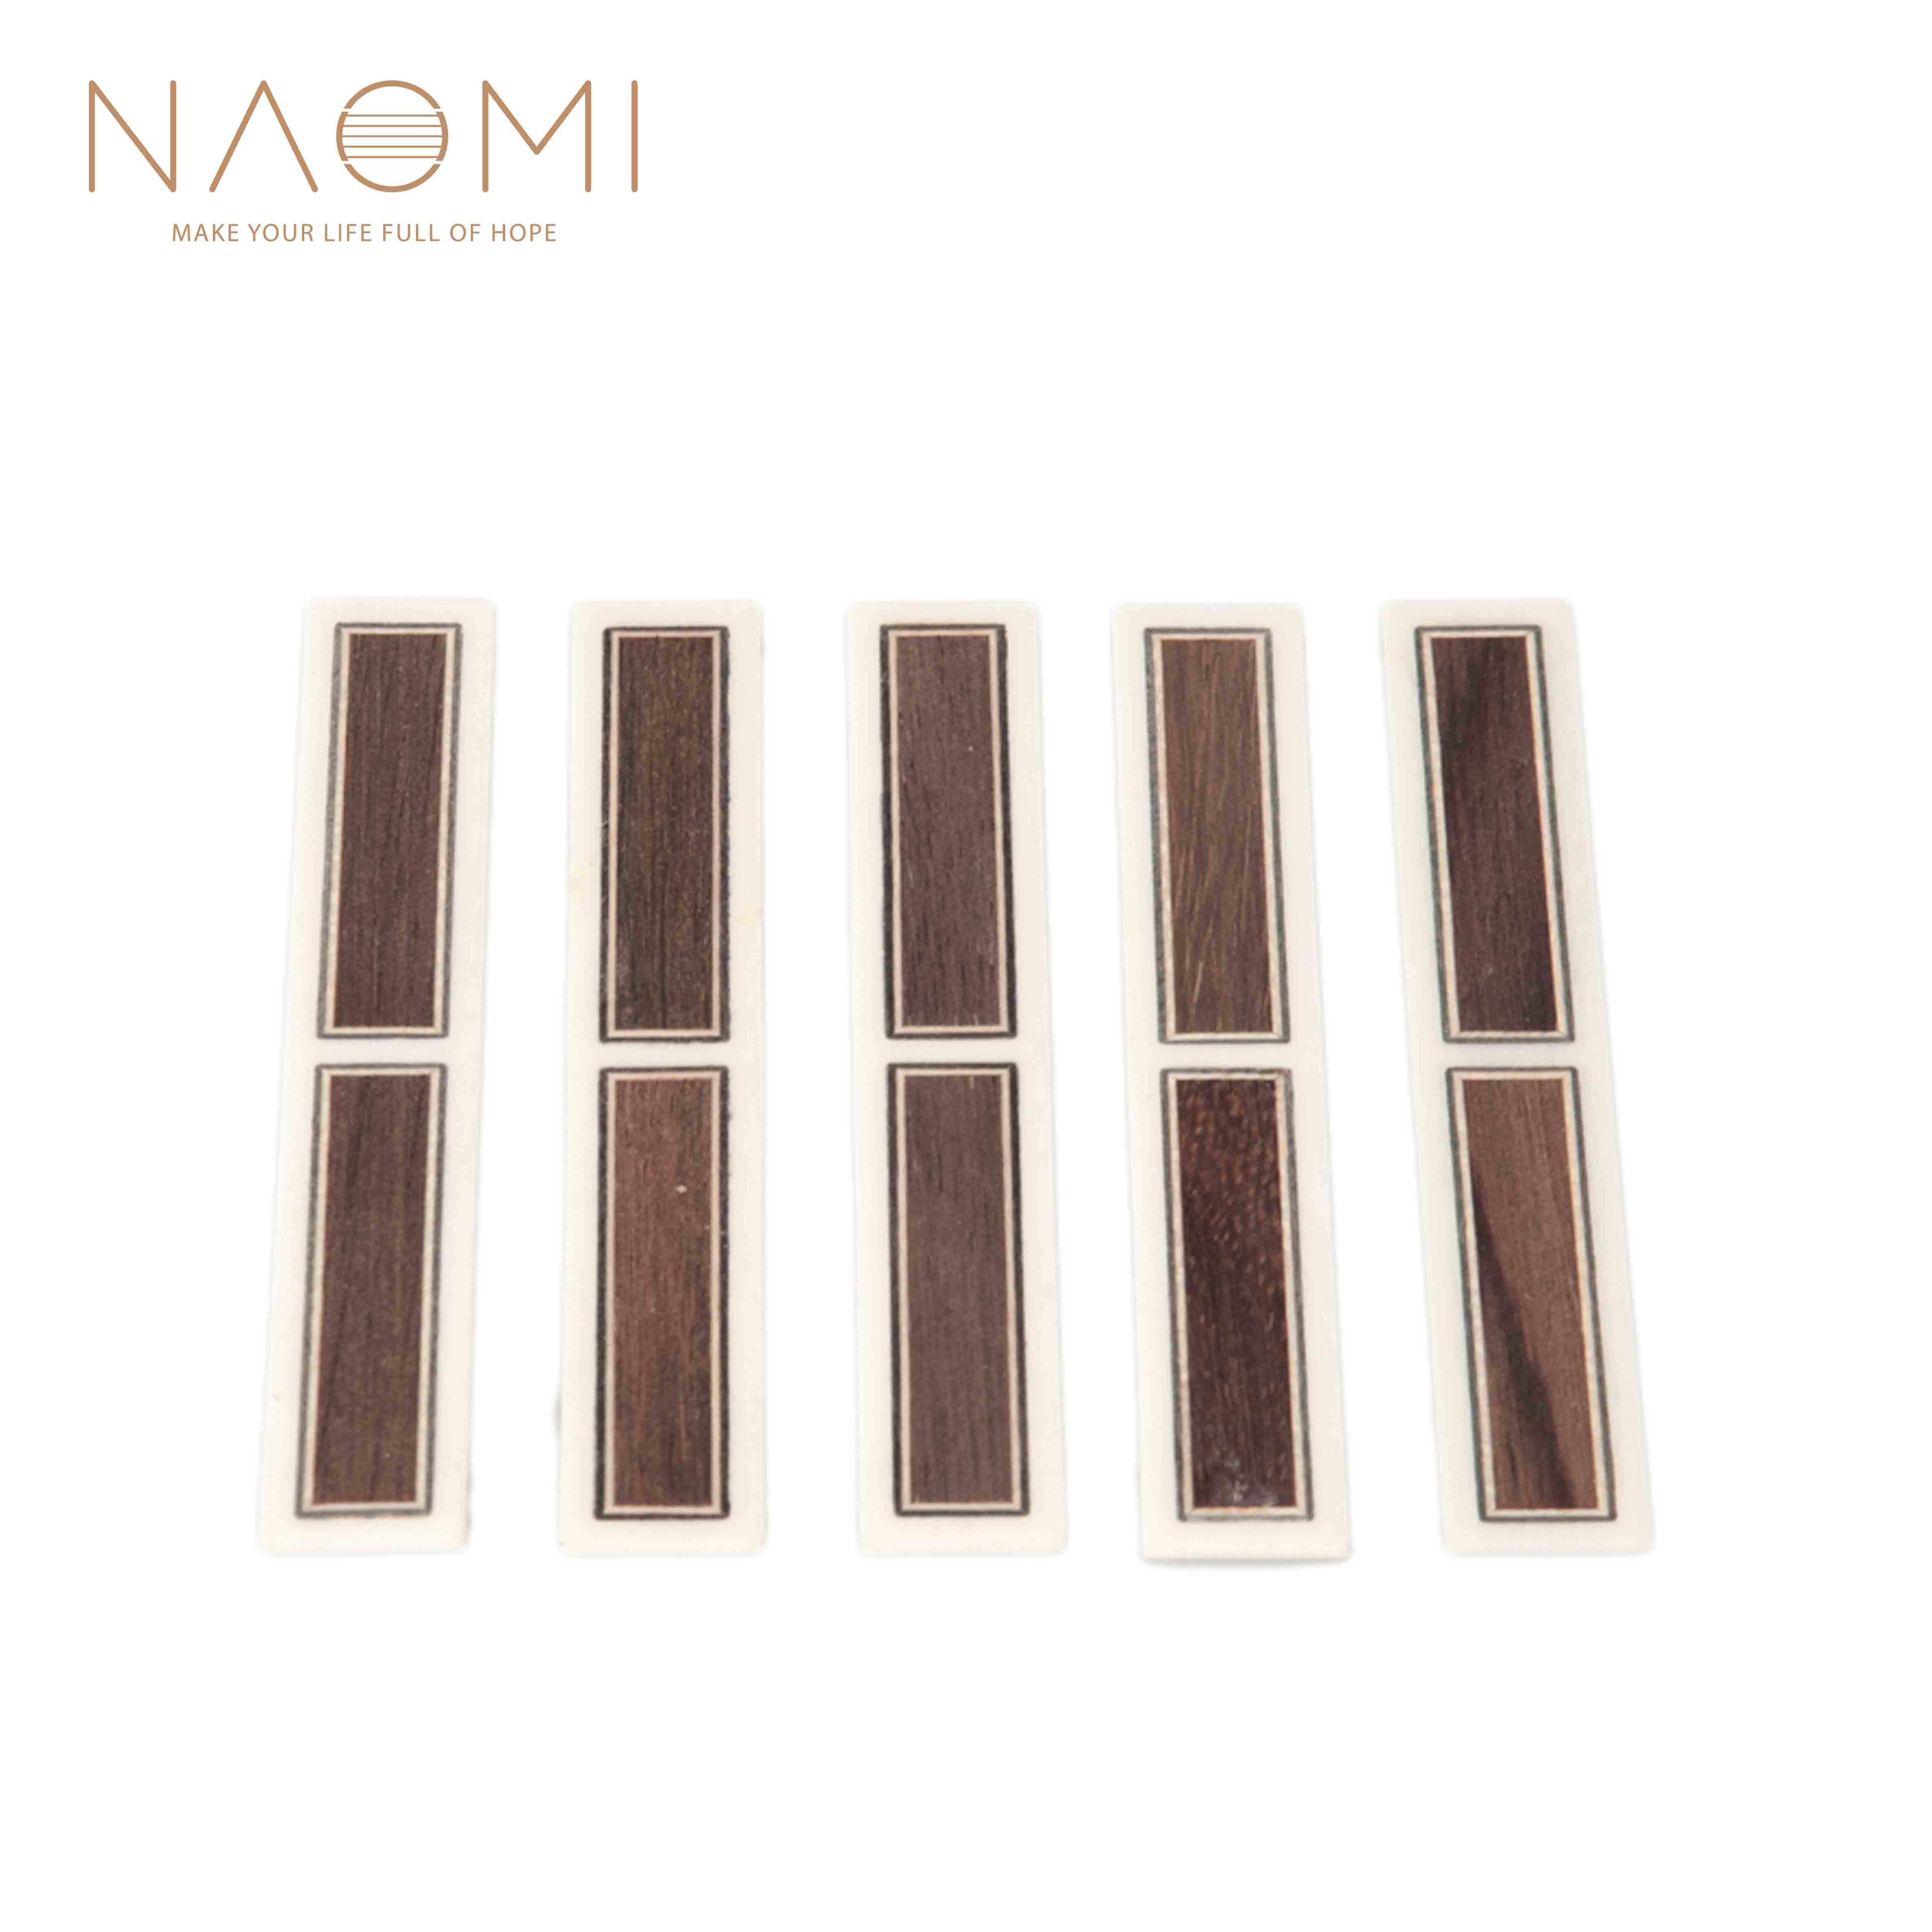 NAOMI 5 Piece 클래식 기타 브리지 타이 블록 Inlay Bone Frame 시리즈 기타 부품 새로운 NA-22